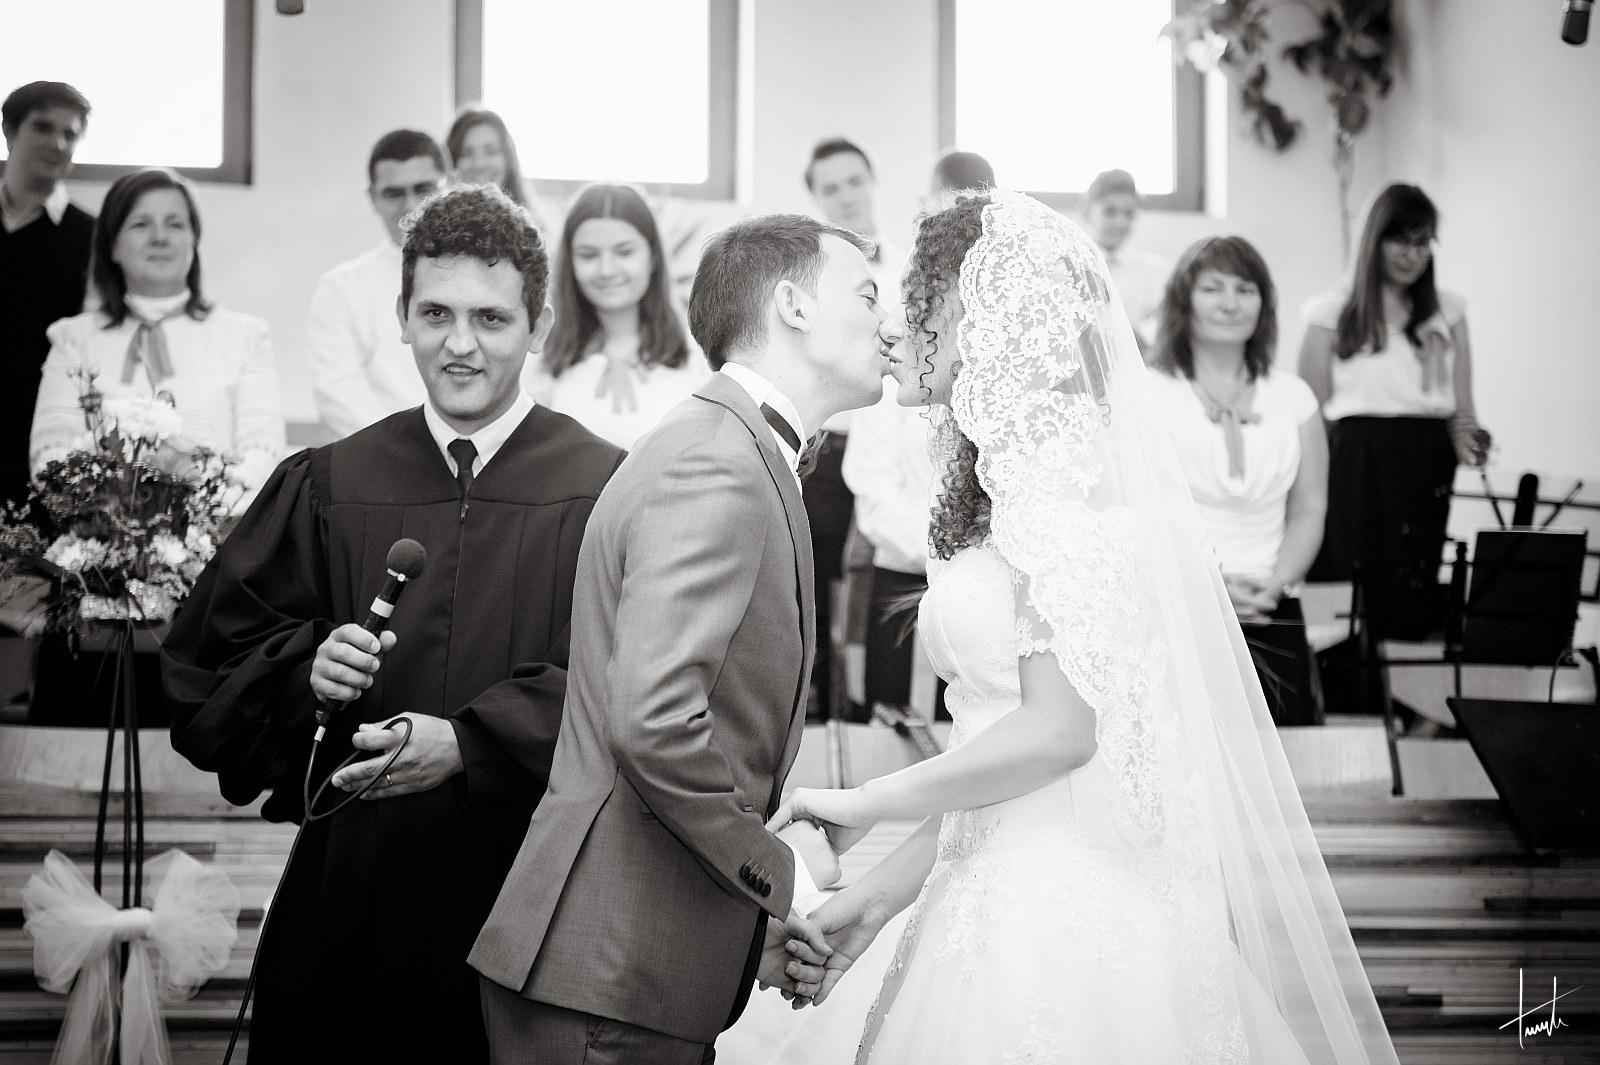 fotografie de nunta - Martha Ionut 20